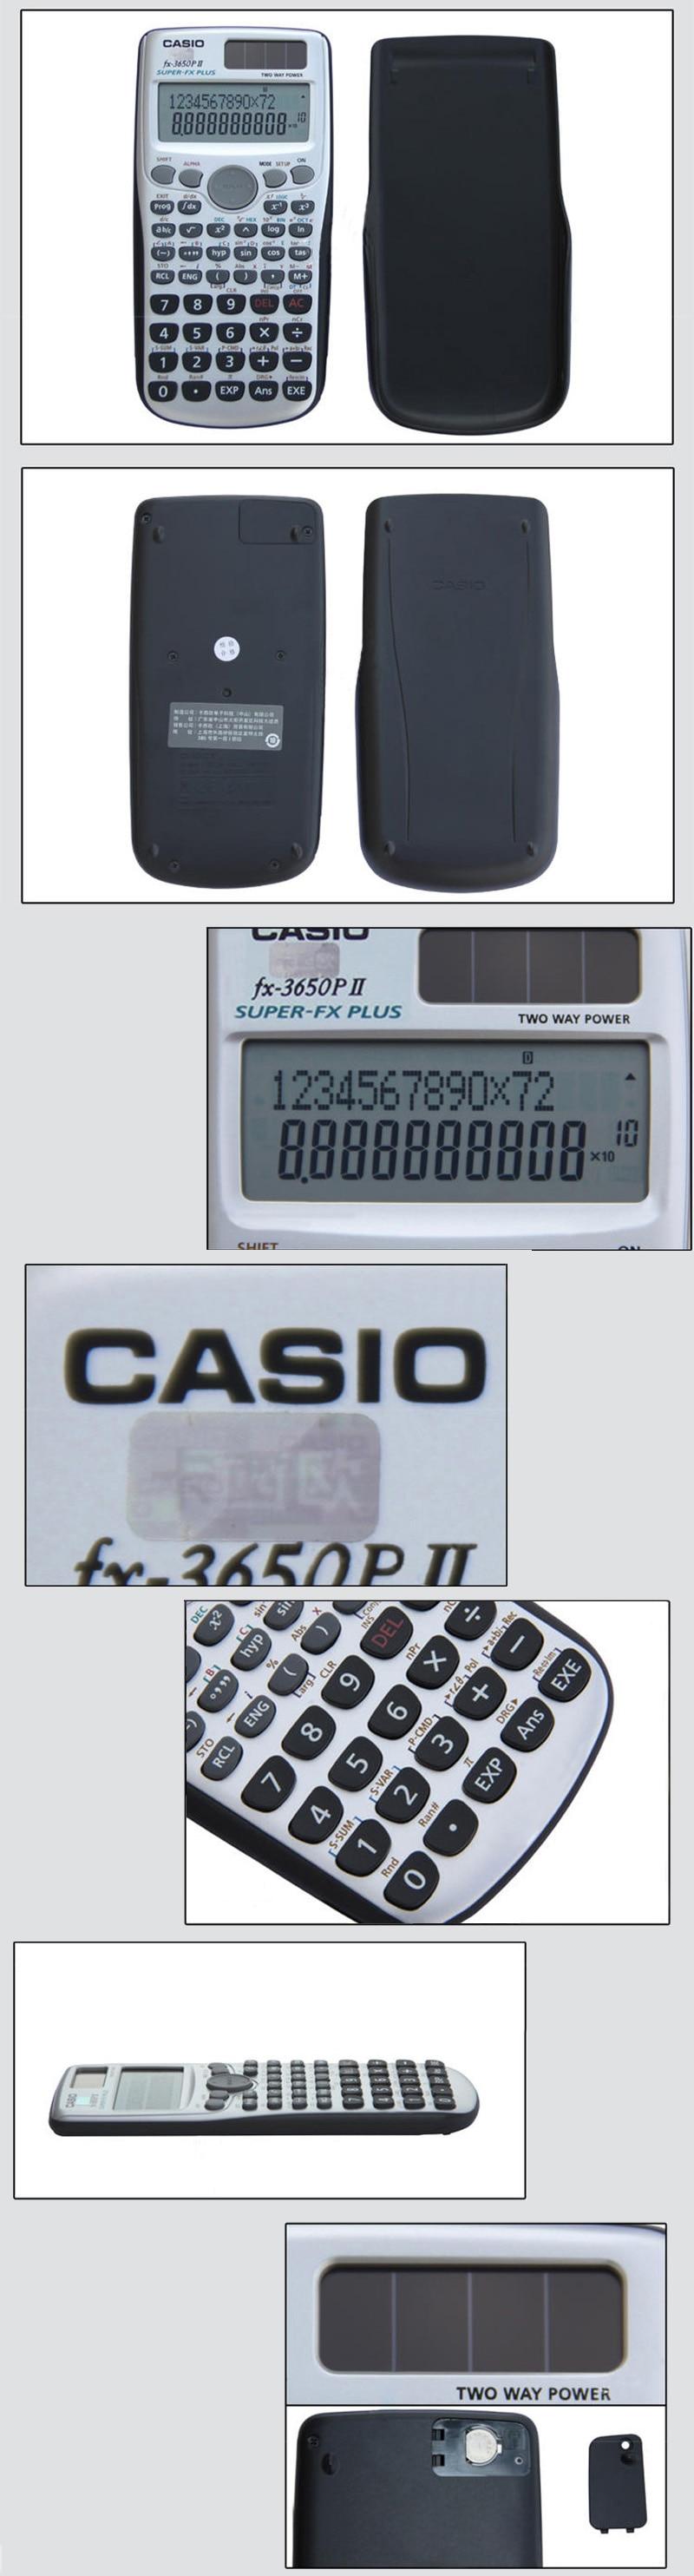 Casio FX-3650PII Scientific Programming Calculator Professional Calculator  for Engineering Statistics